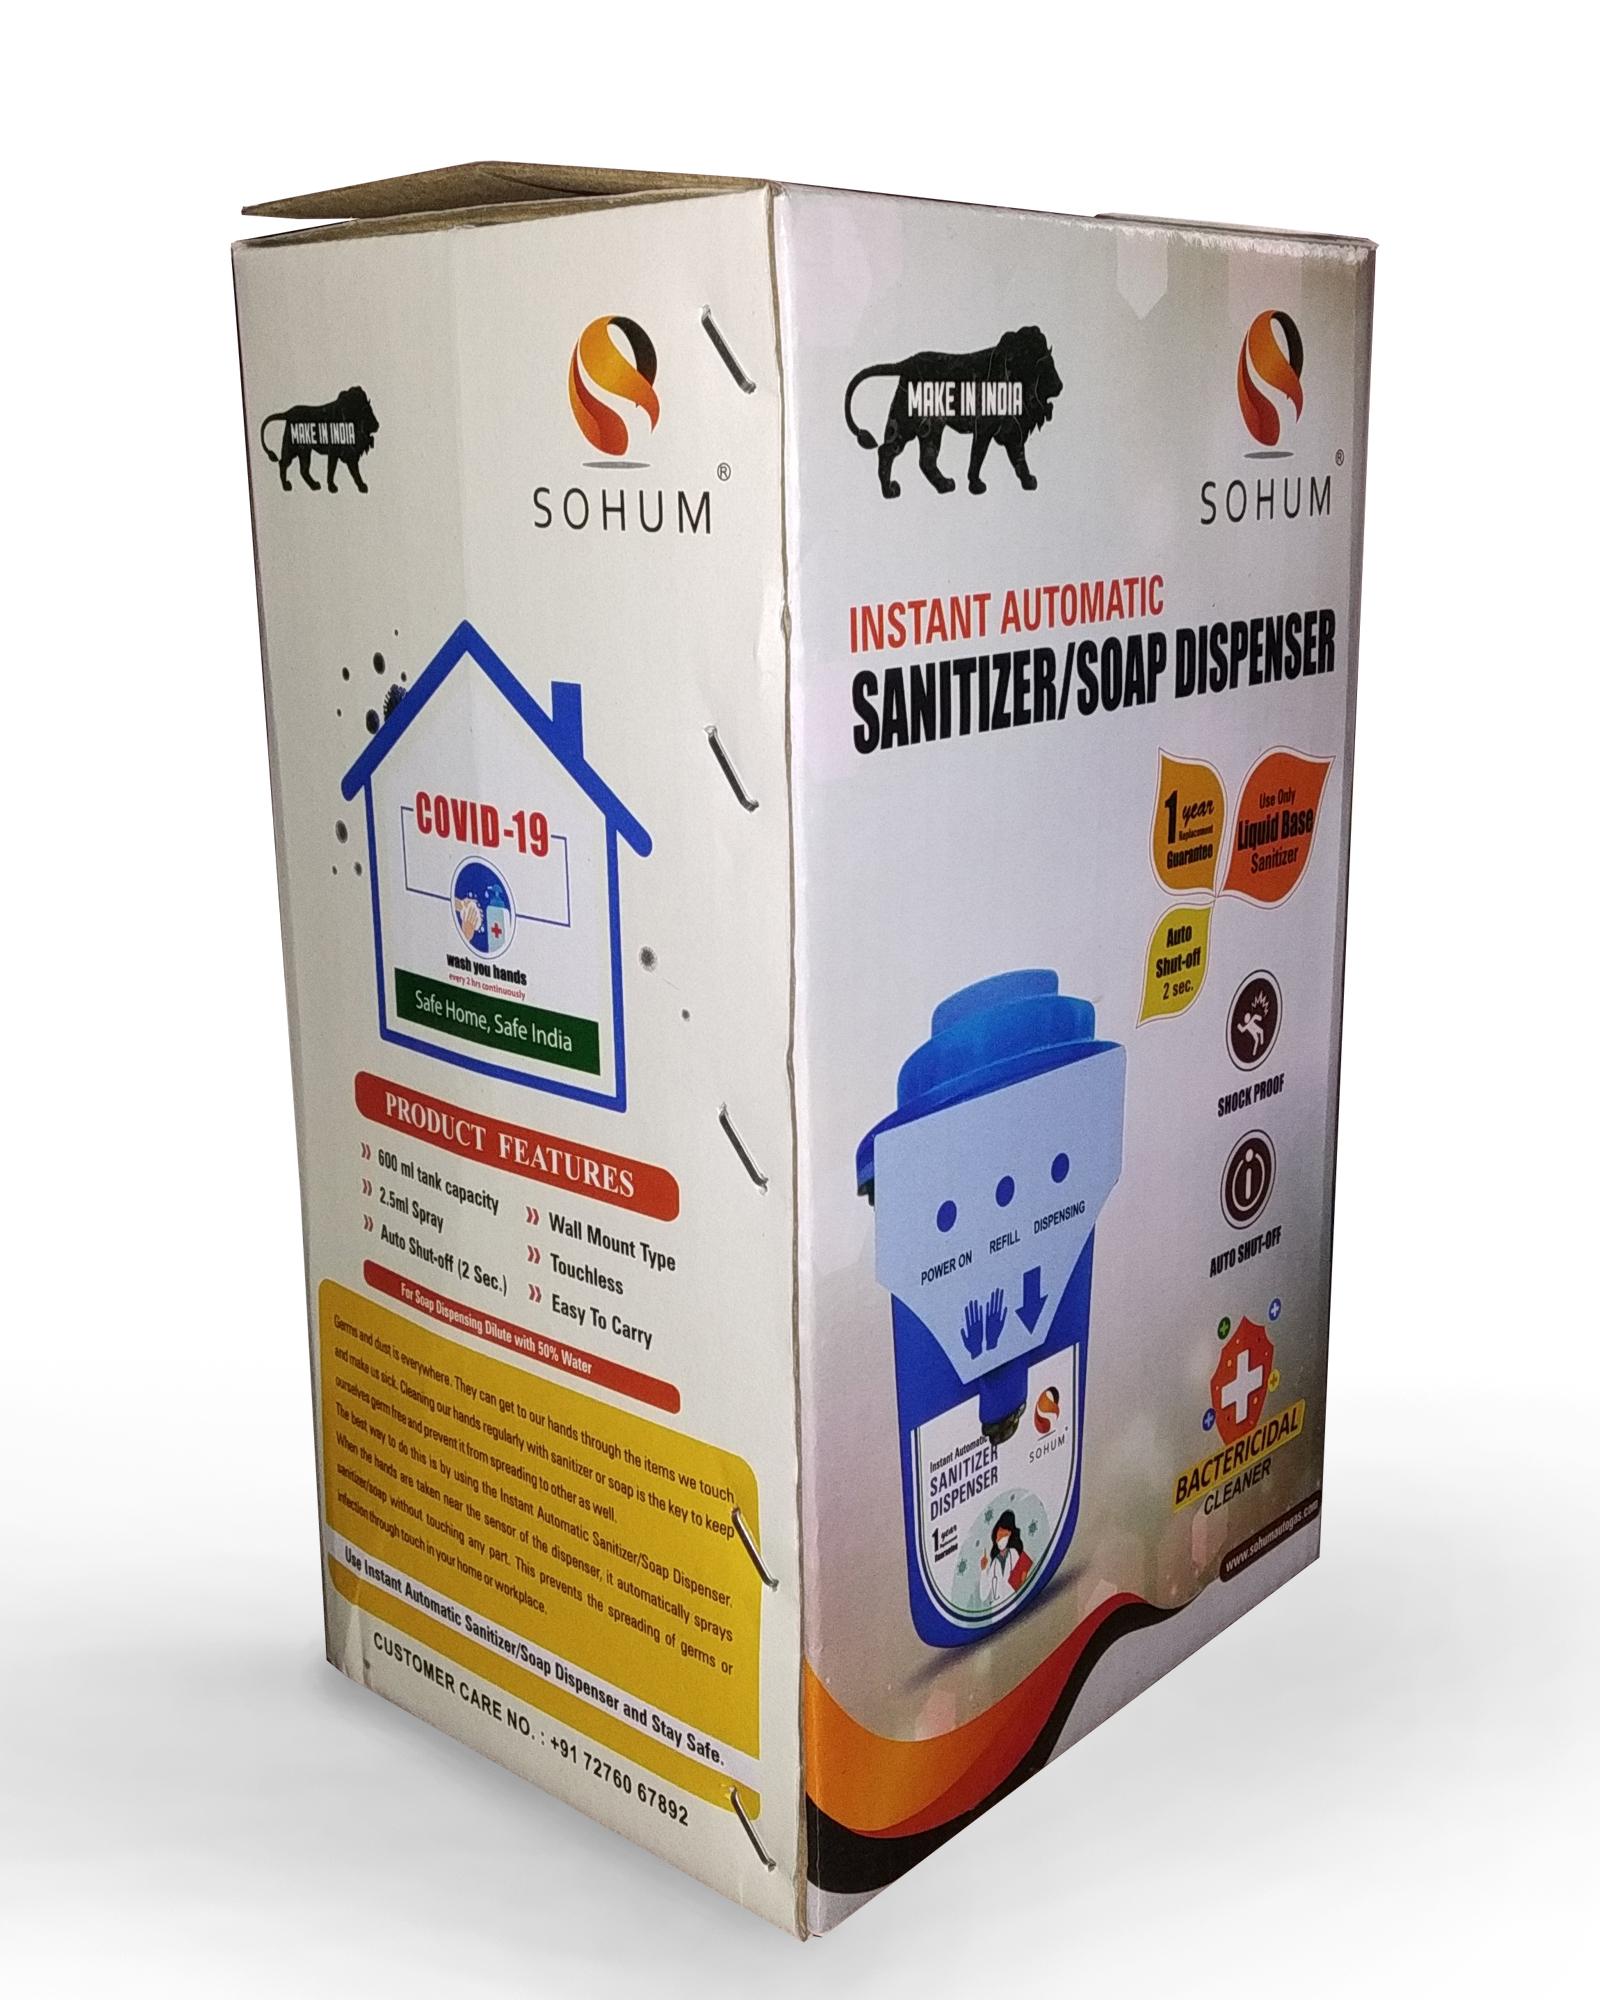 SOHUM Instant Automatic Sanitizer And Soap Dispenser.